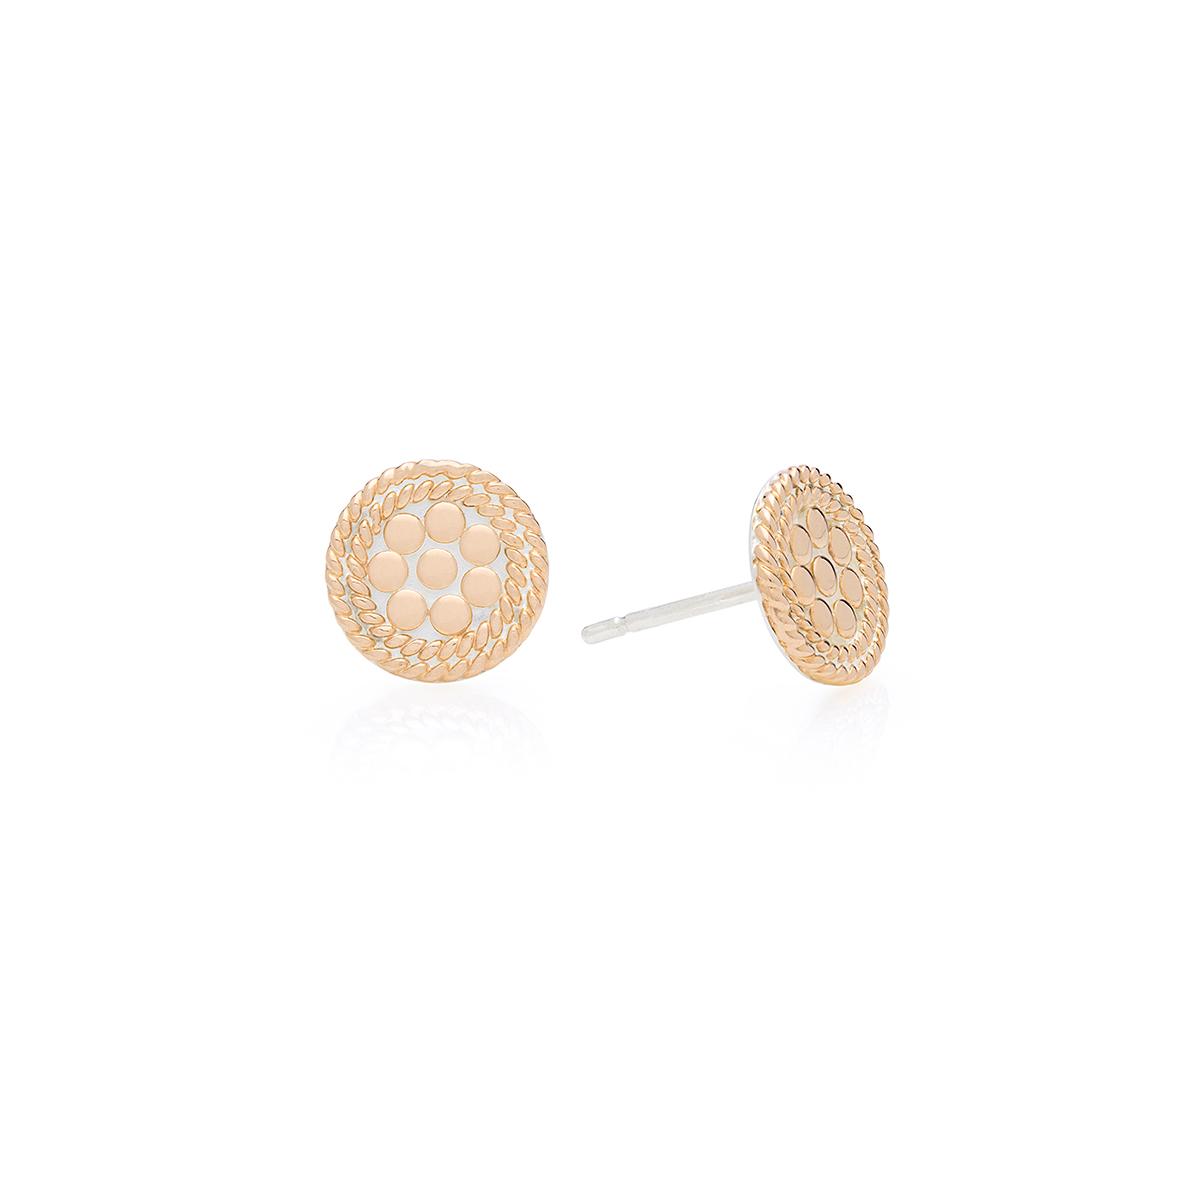 CLASSIC MINI CIRCLE STUD EARRINGS - GOLD